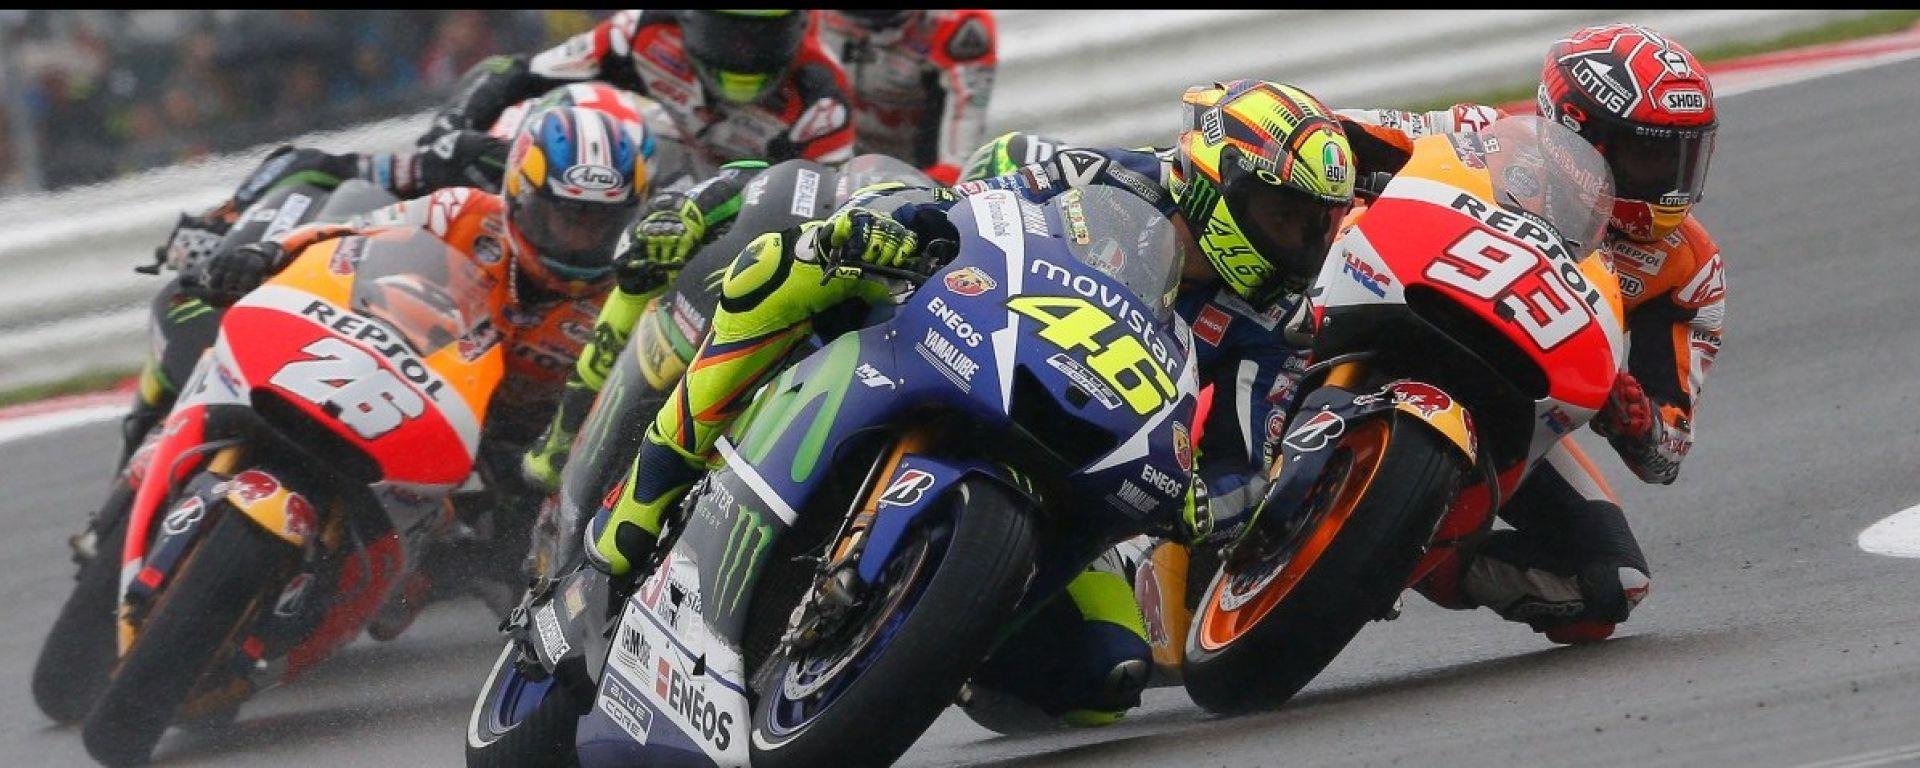 MotoGP Gran Bretagna Silverstone 2018: gli orari TV